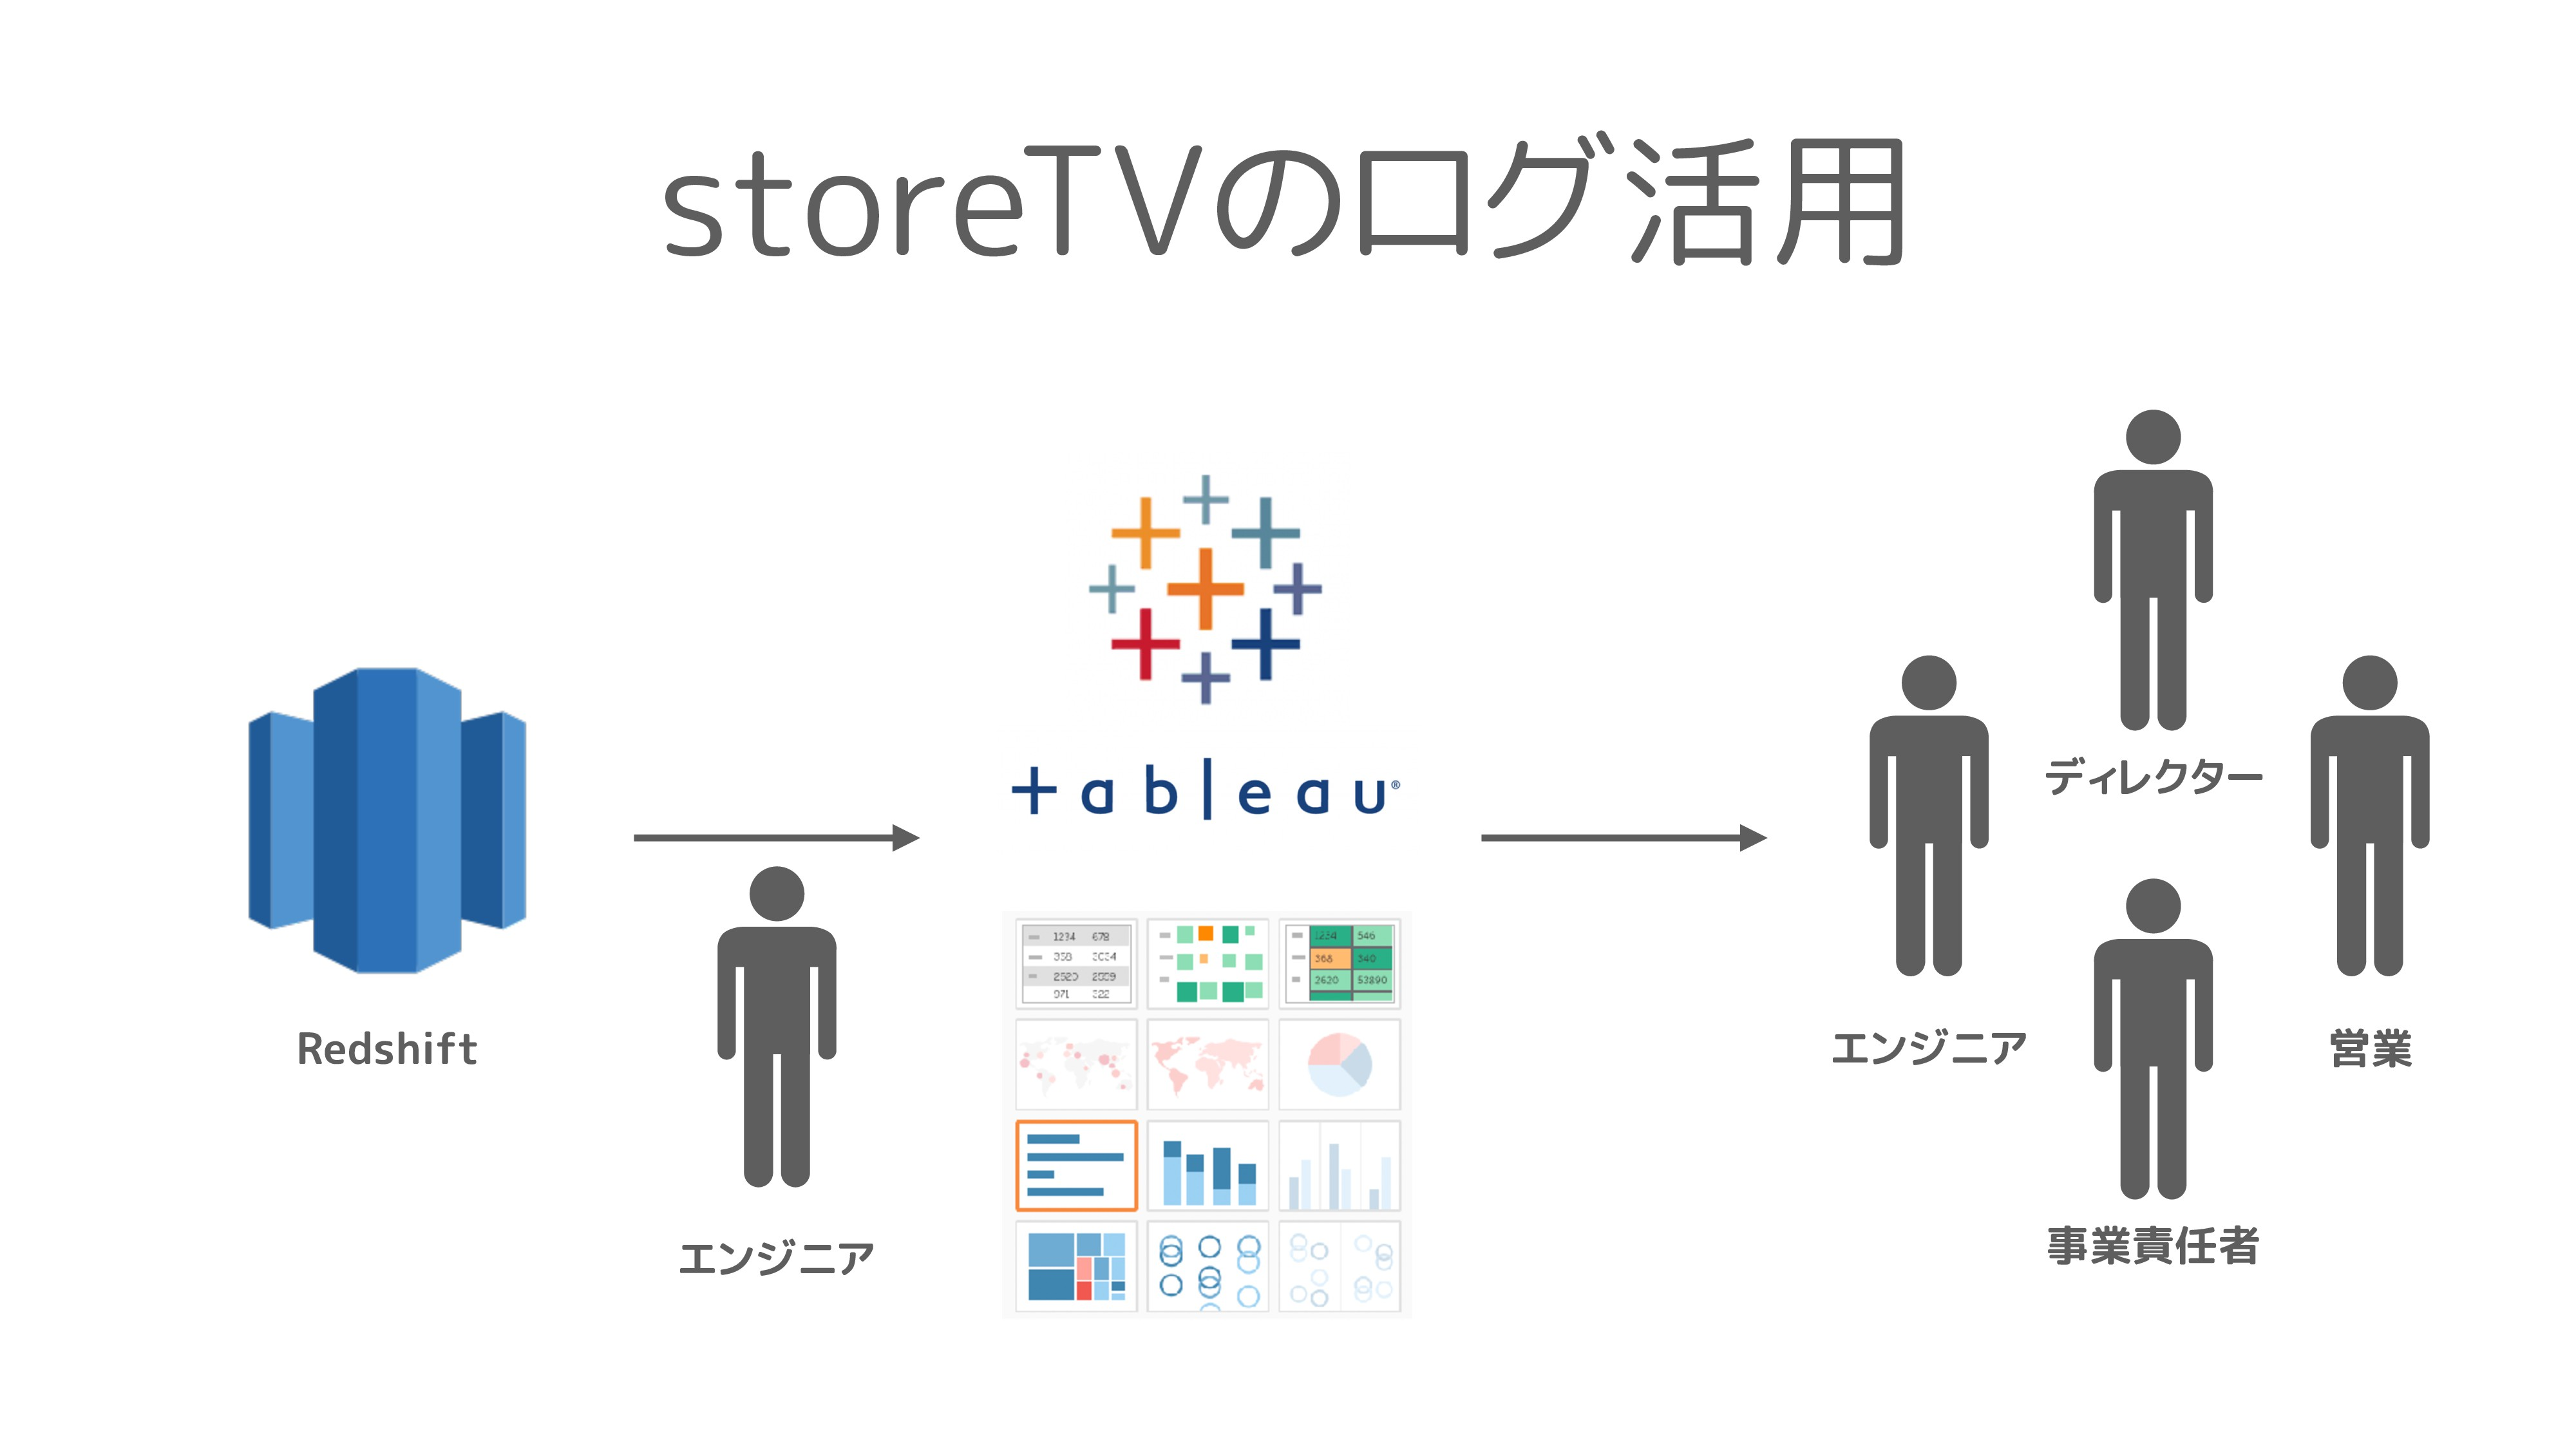 Redshift storeTVのログ活用 ディレクター 事業責任者 営業 エンジニア エンジ...